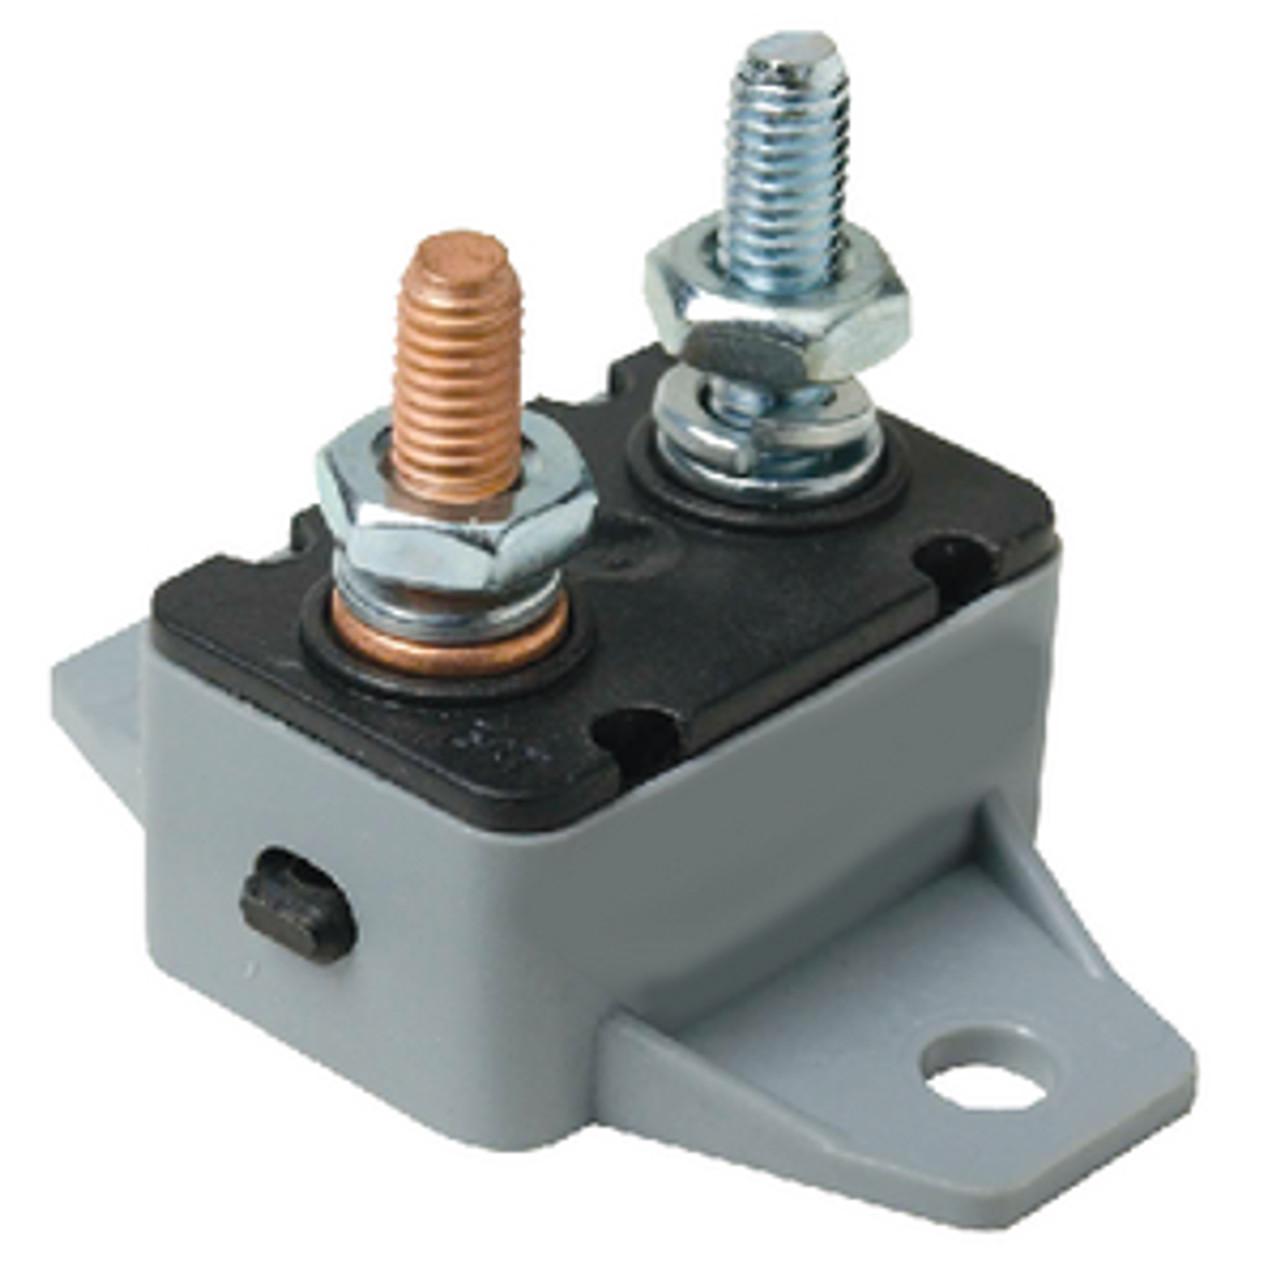 Buss Marine Grade Heavy Manual Reset 50 amp DC Breaker Fuse #25450